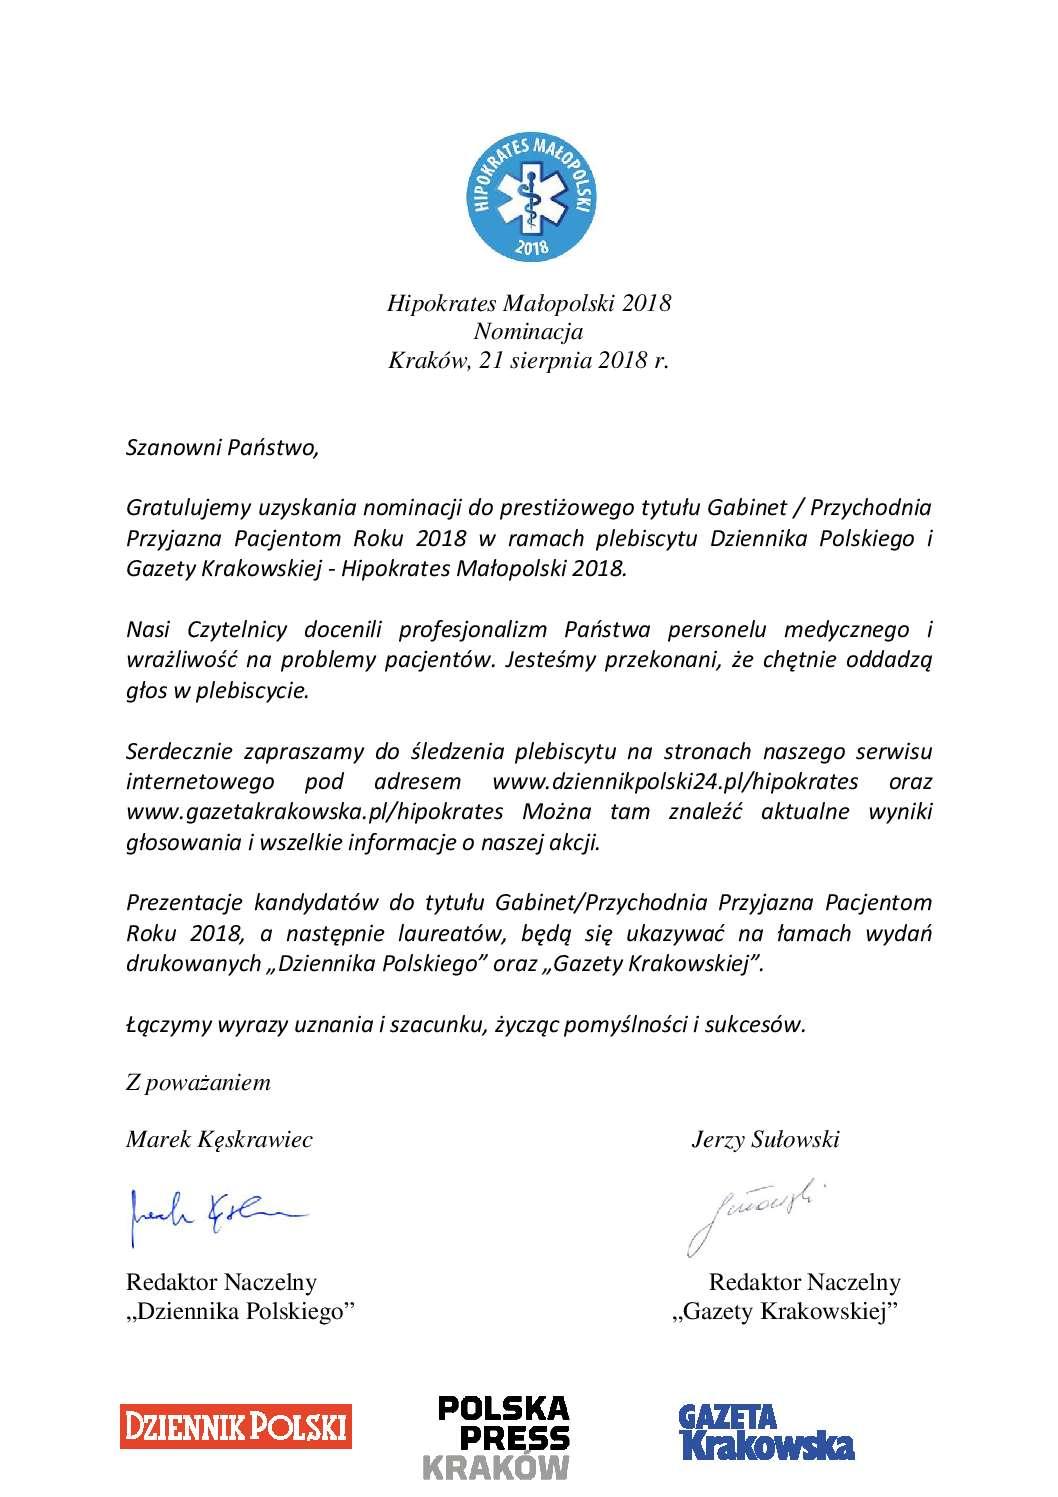 Hipokrates Małopolski 2018